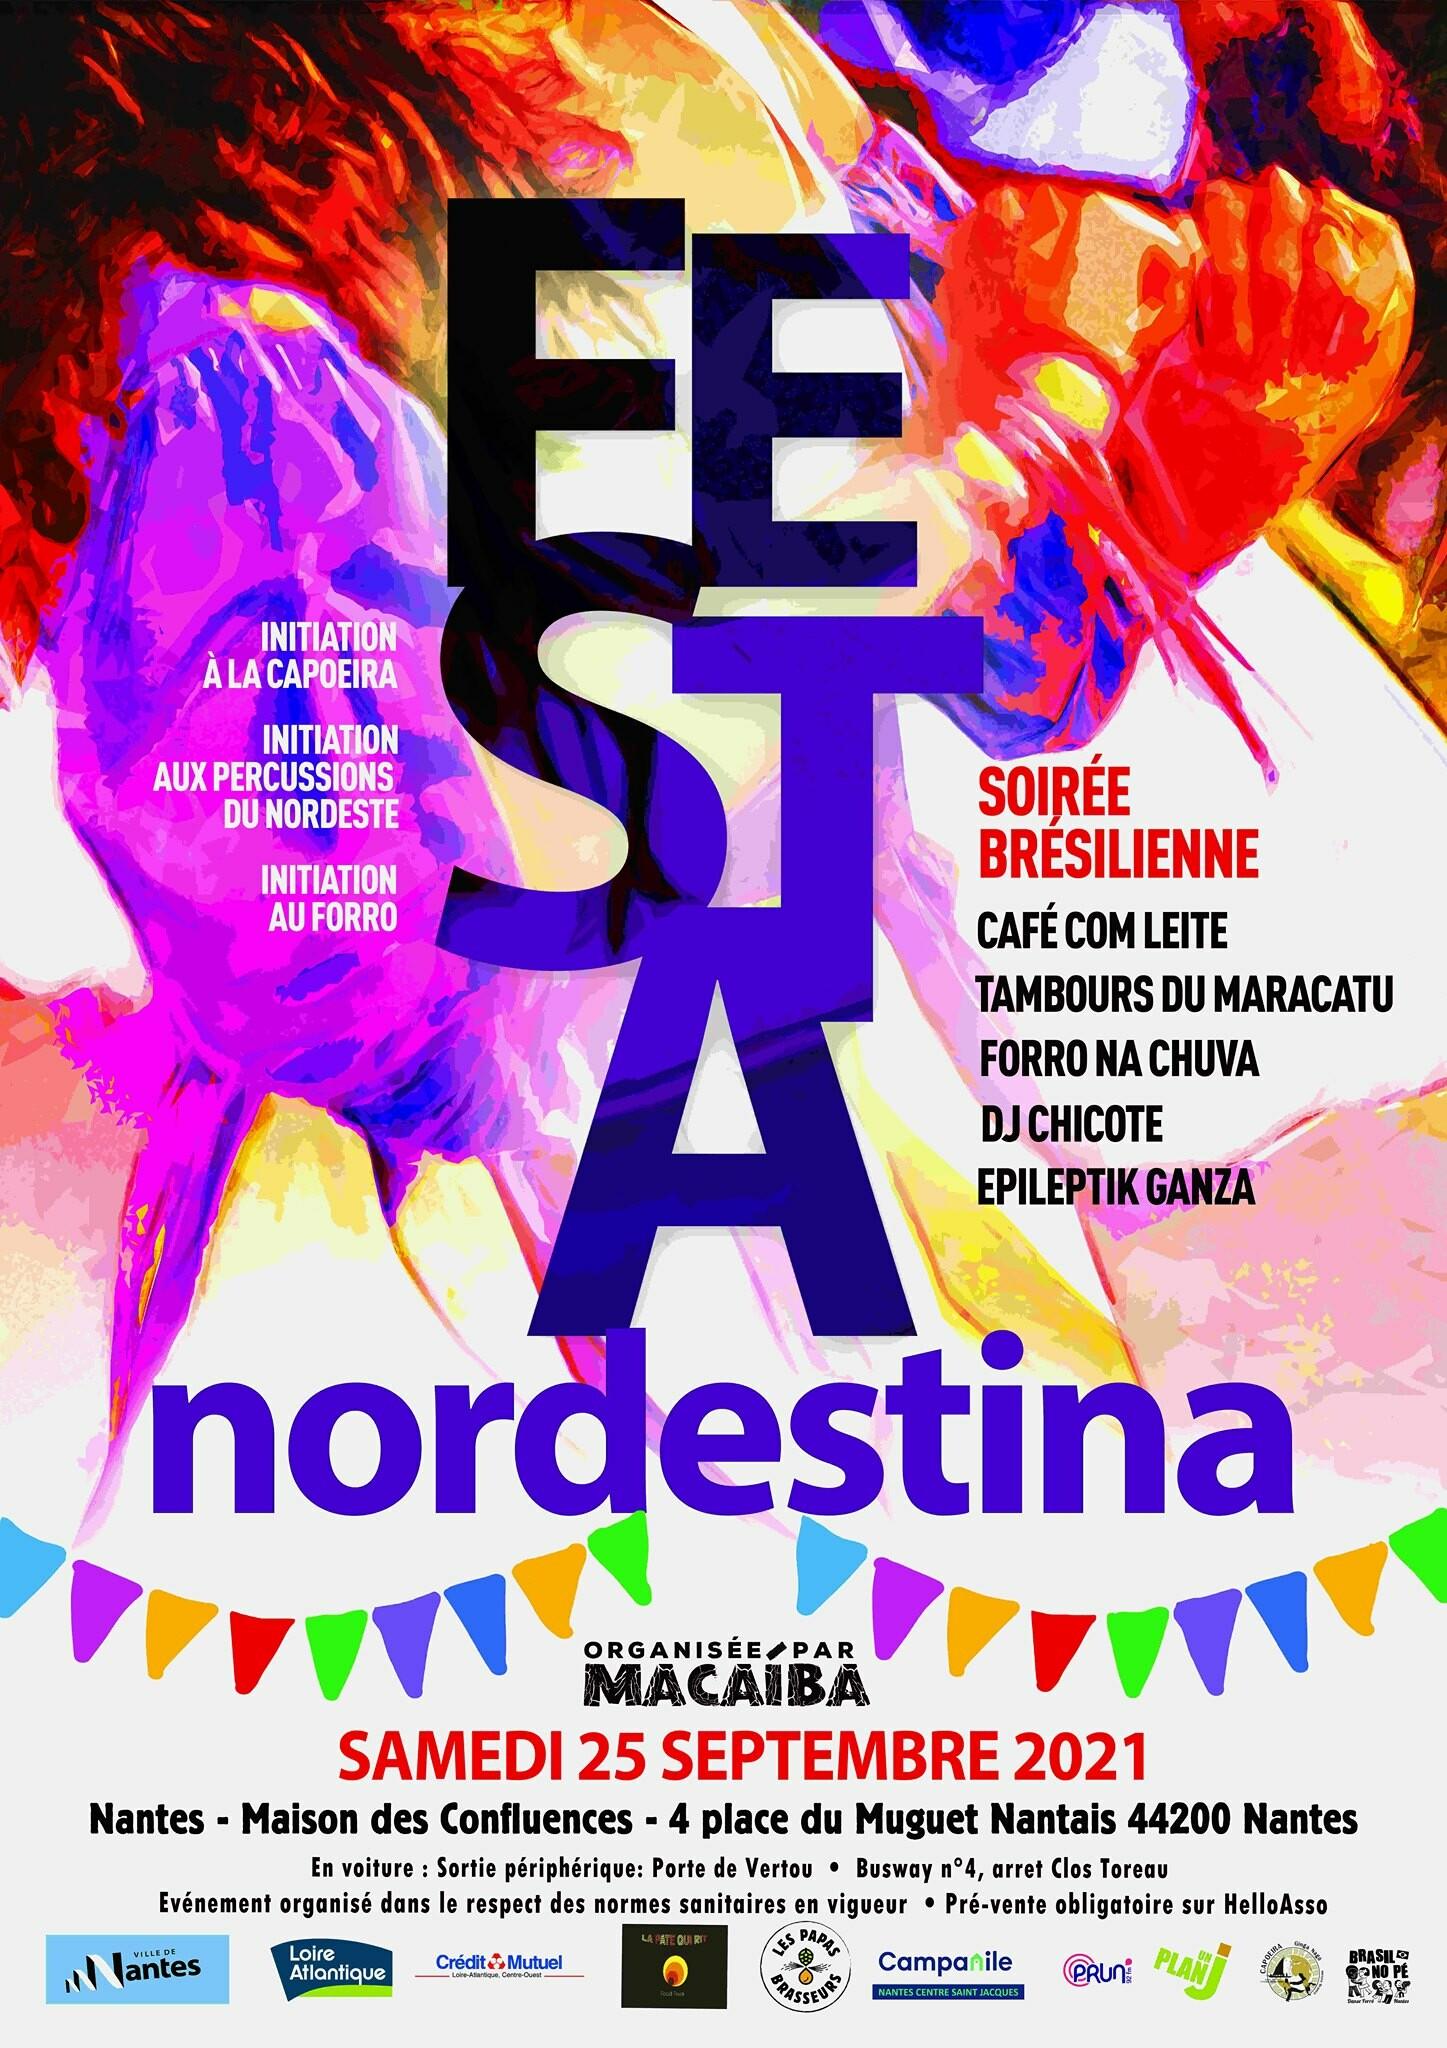 Festa Nordestina